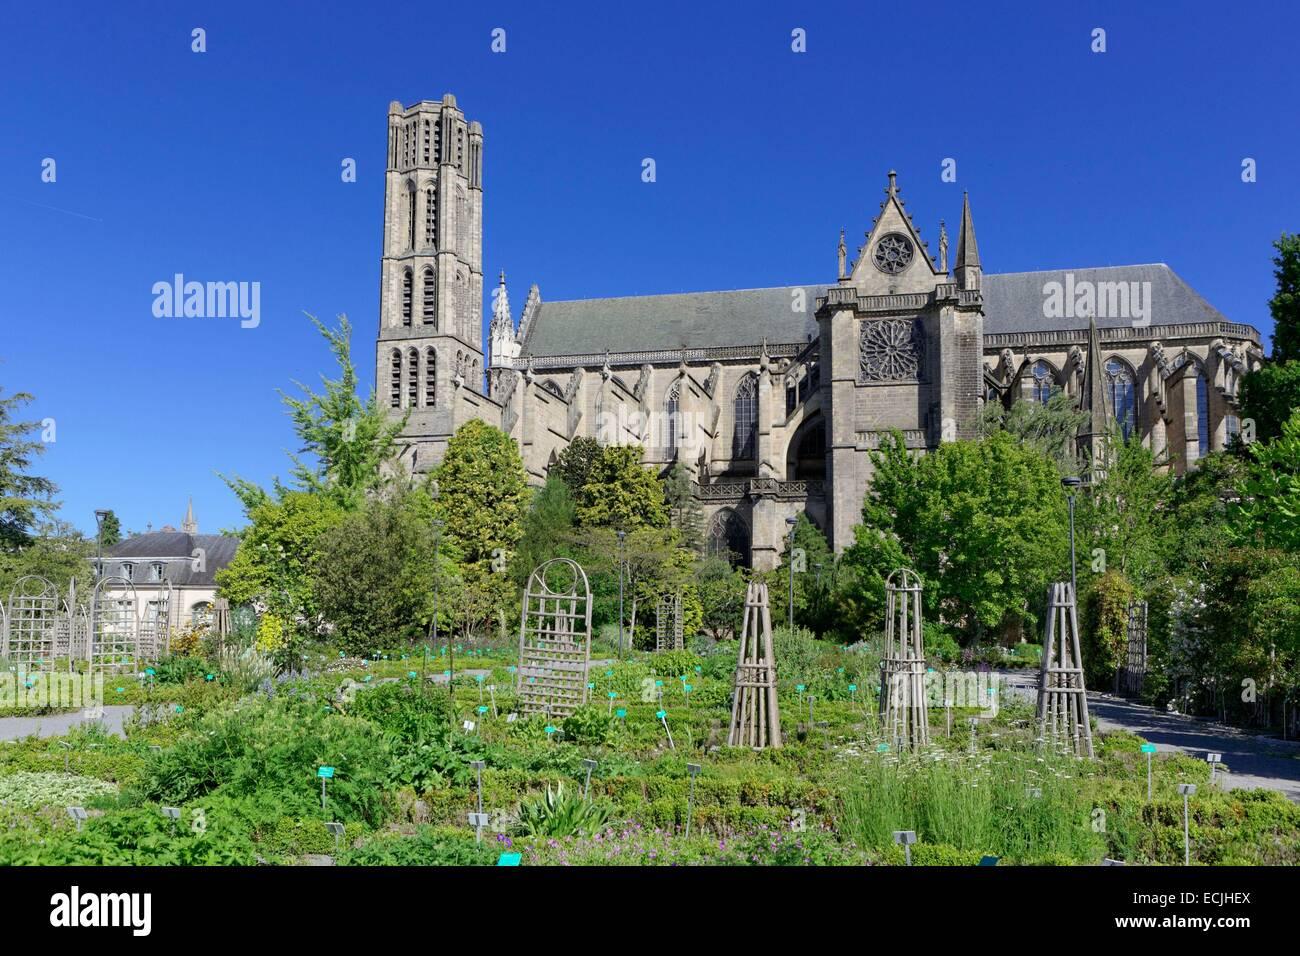 France haute vienne limoges cathedral of saint etienne jardin stock photo royalty free - Jardin mediterraneen limoges ...